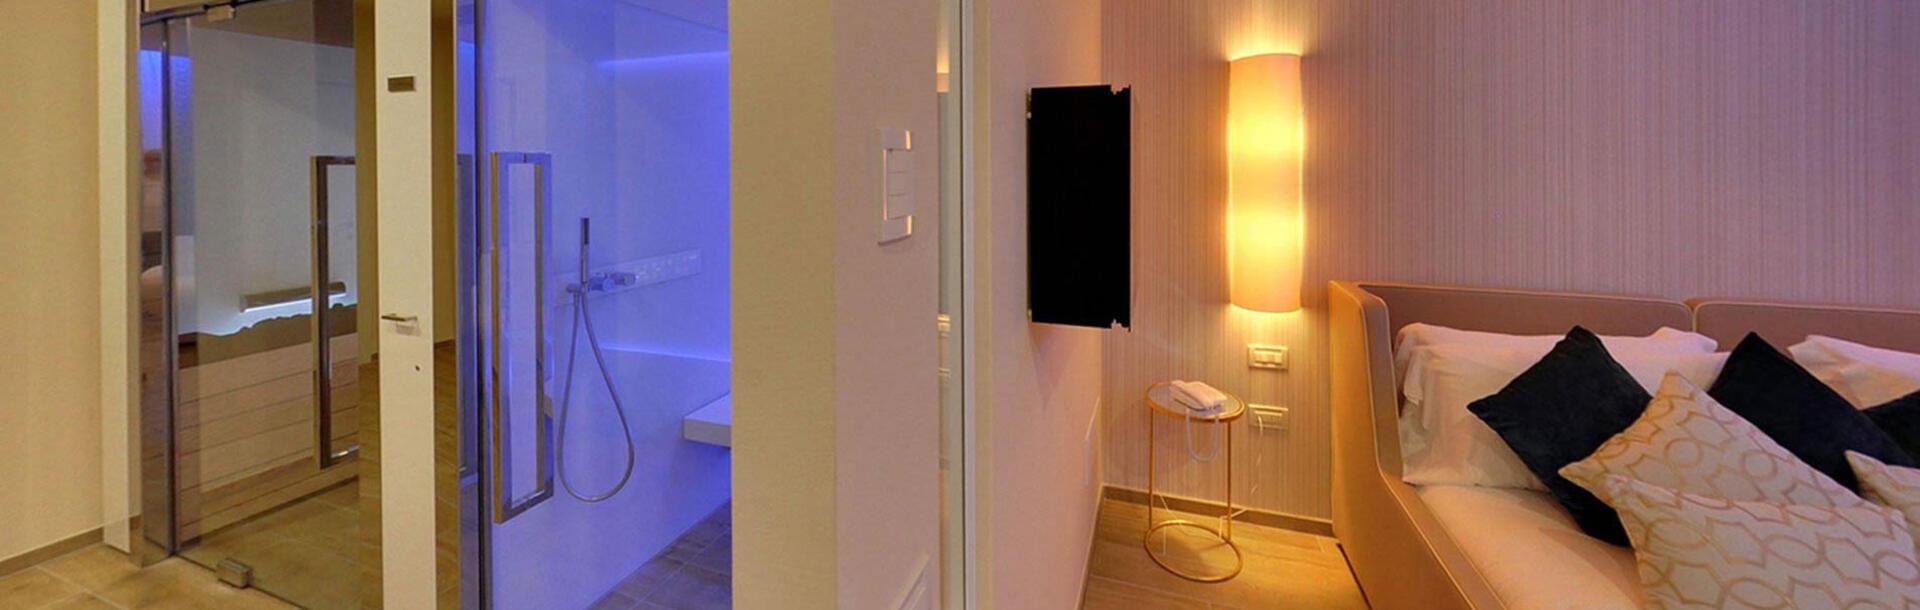 hotel-montecarlo pl wellness-suite-zaffiro 013